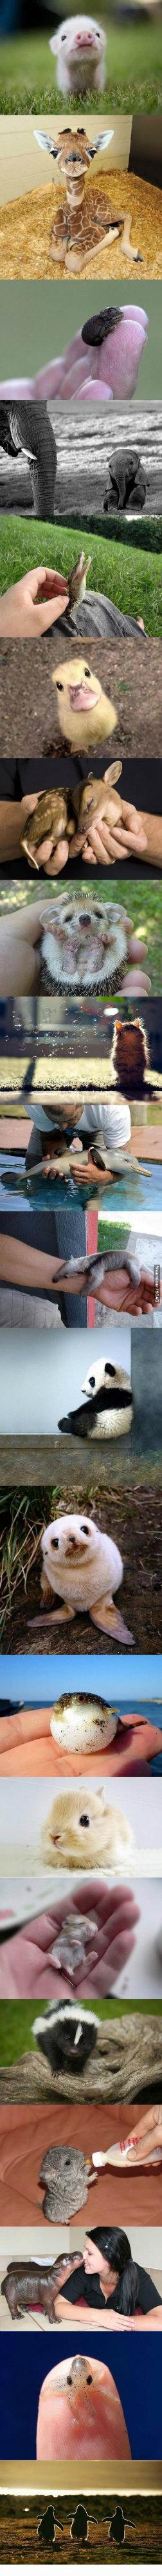 D'awwwwww. Cute animal babies . dawww